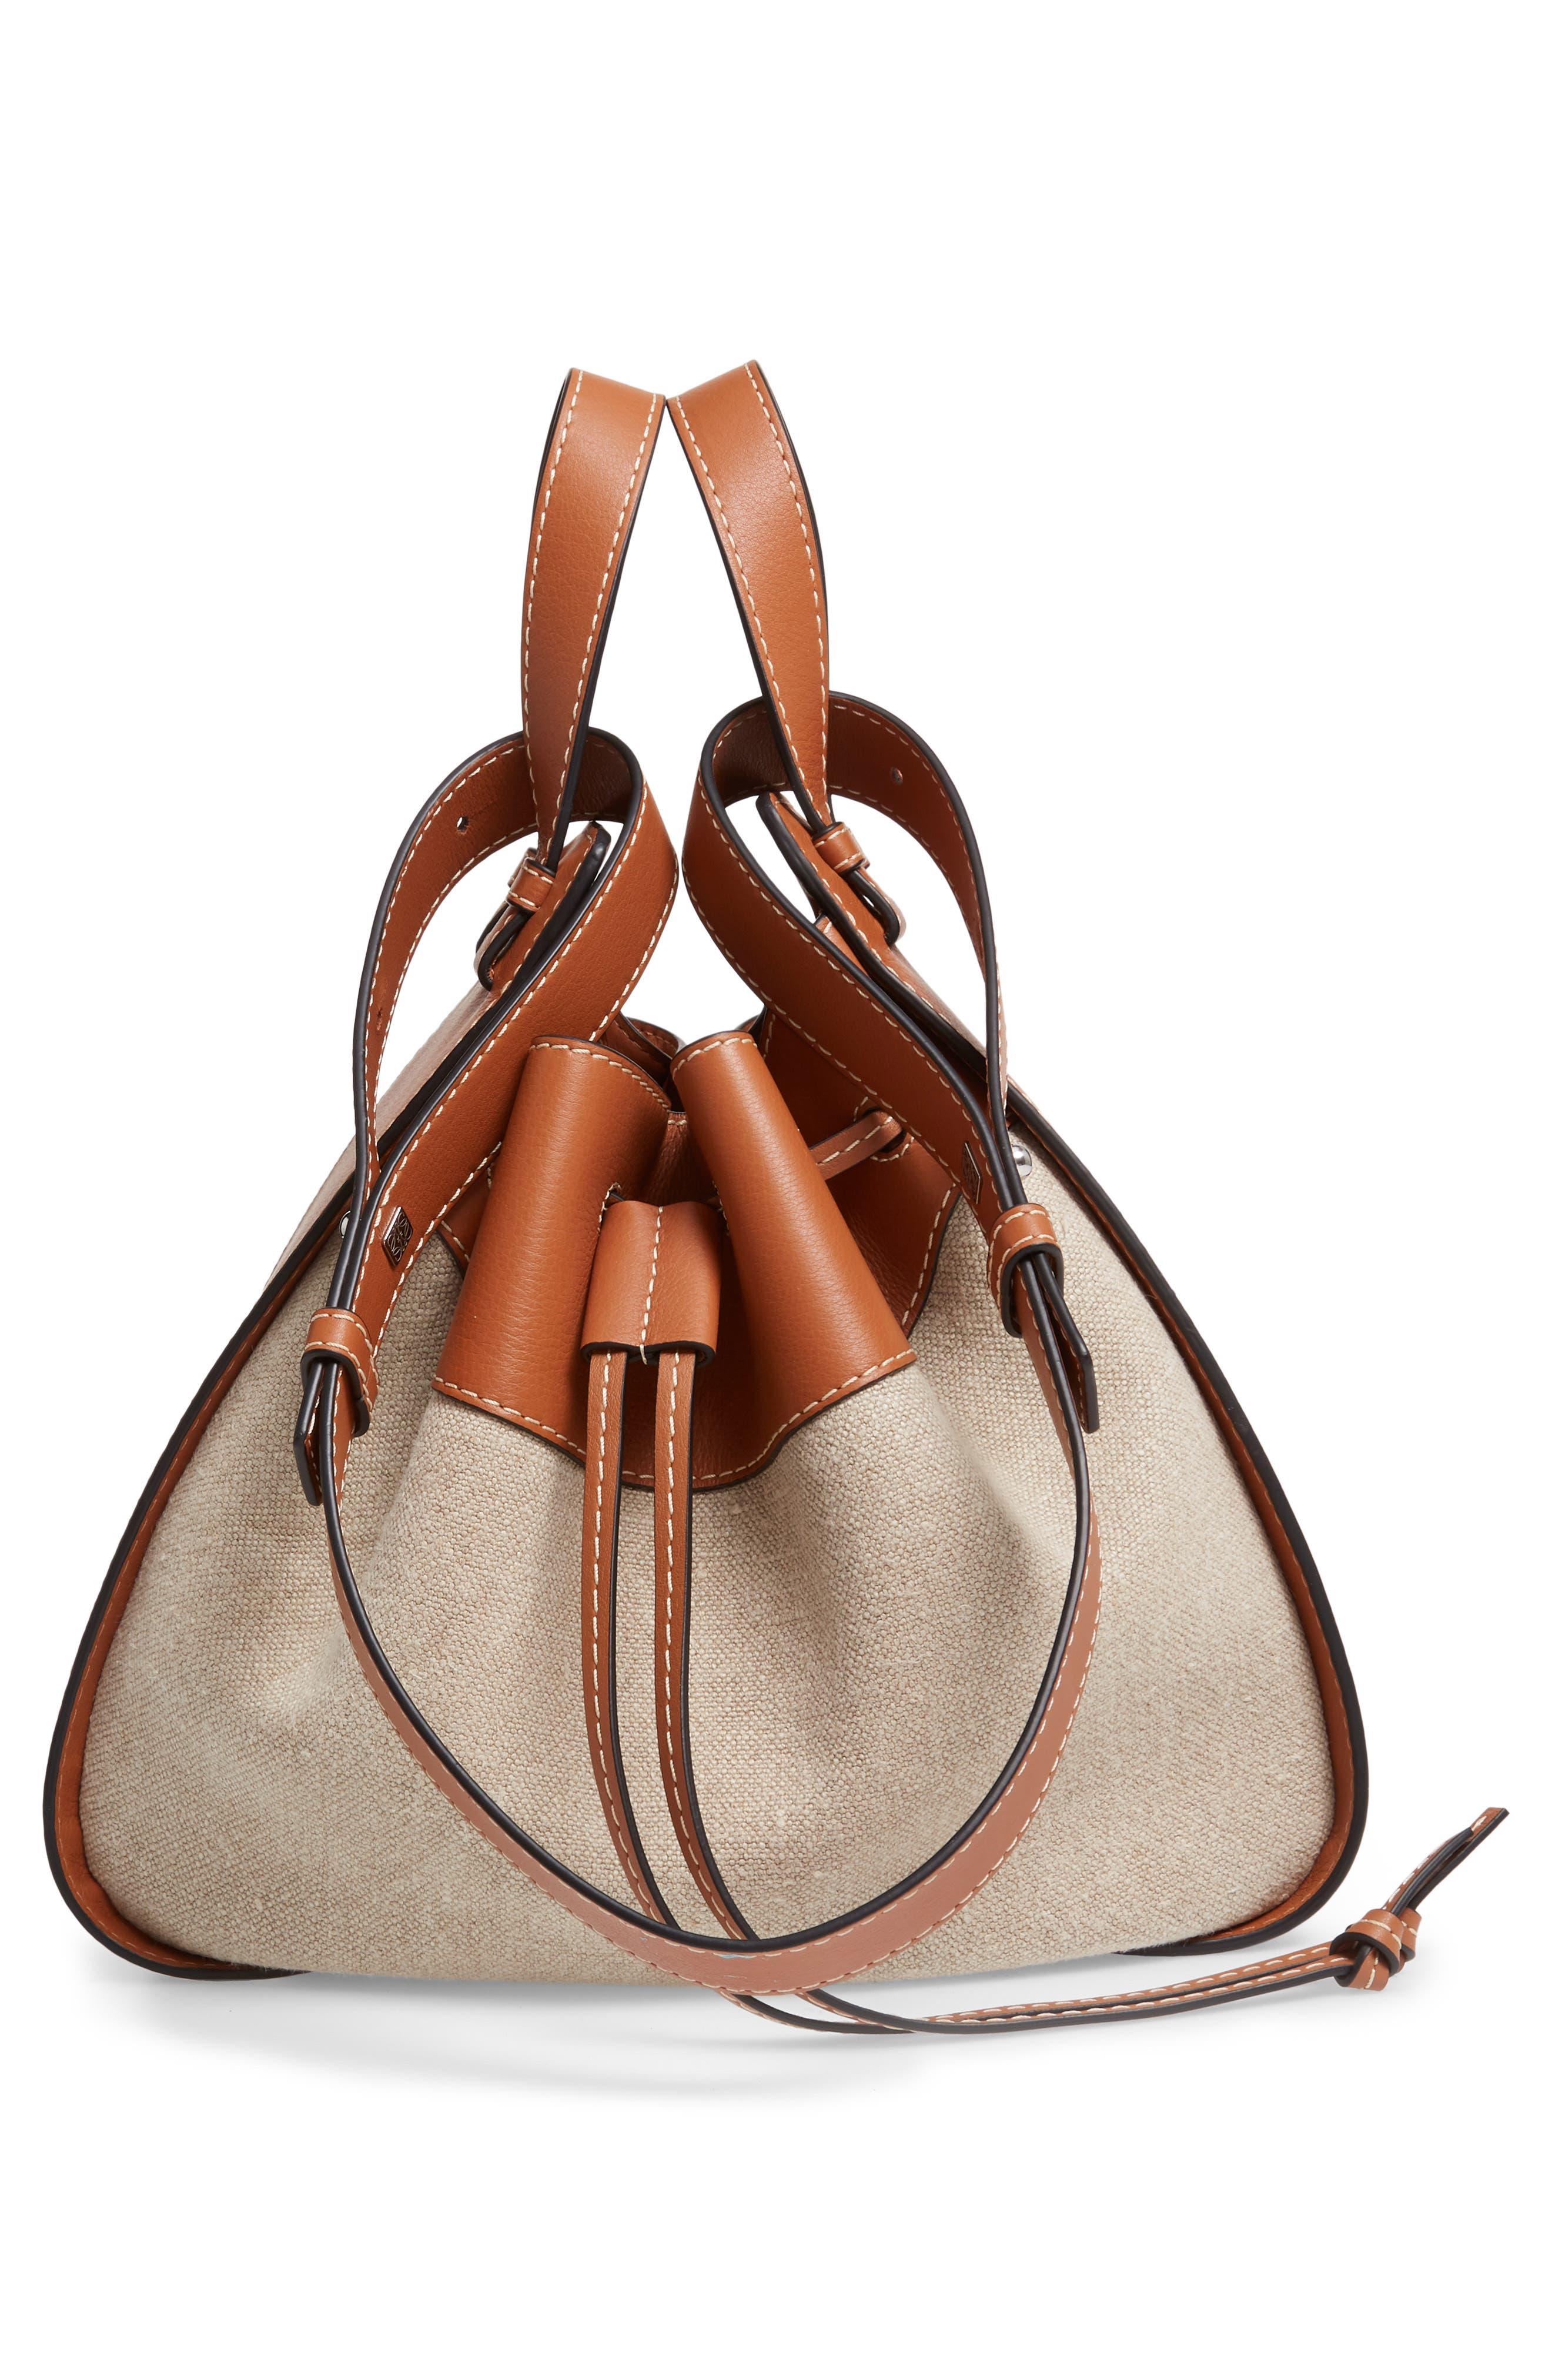 LOEWE,                             Hammock Drawstring Linen & Leather Hobo,                             Alternate thumbnail 6, color,                             TAN/ NATURAL